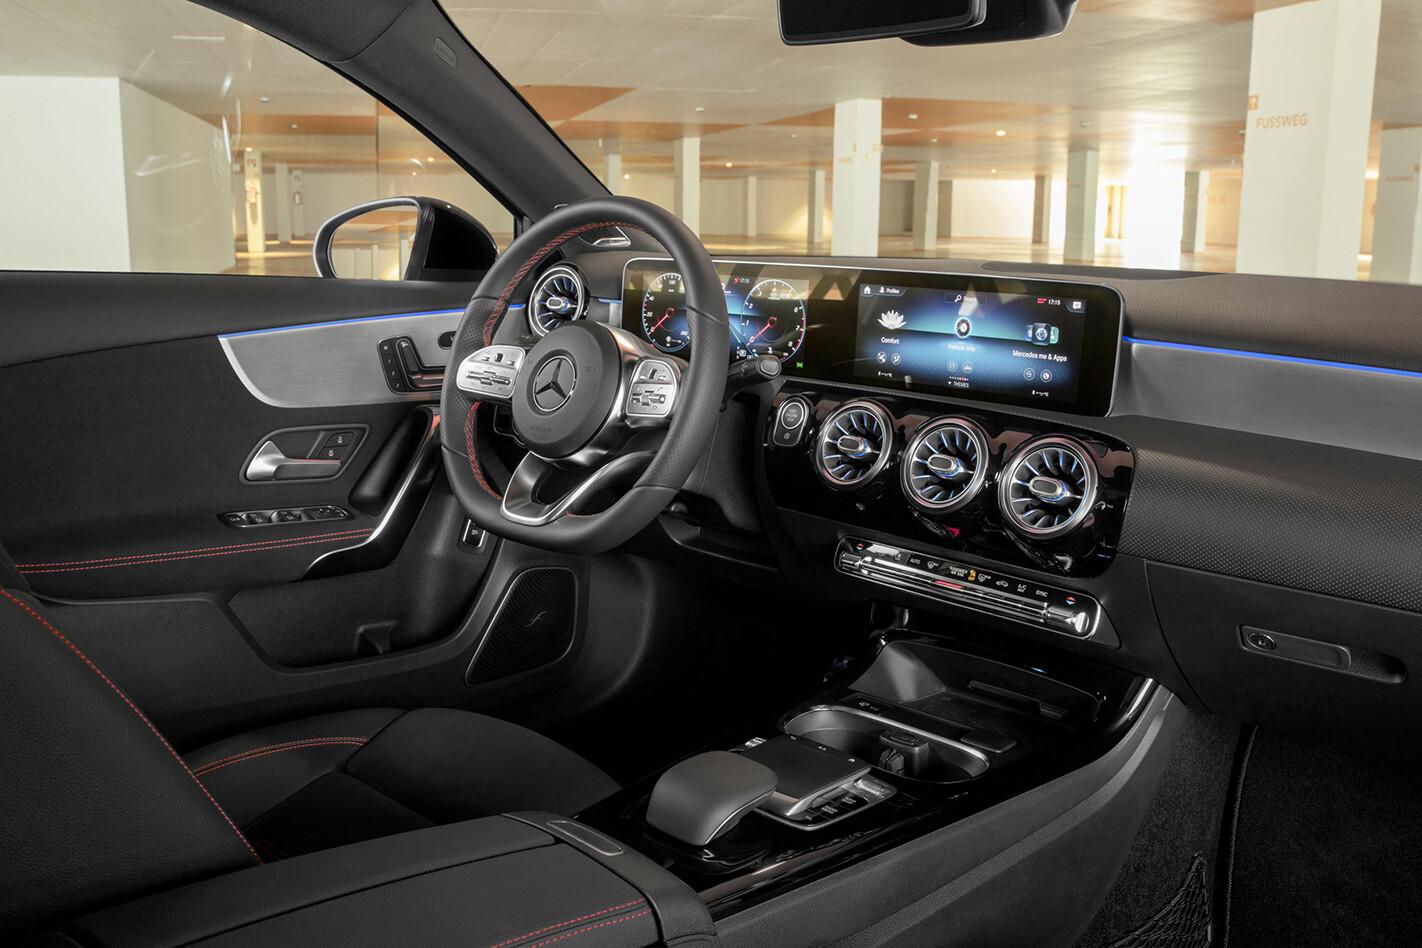 Mercedes-Benz A200 interior